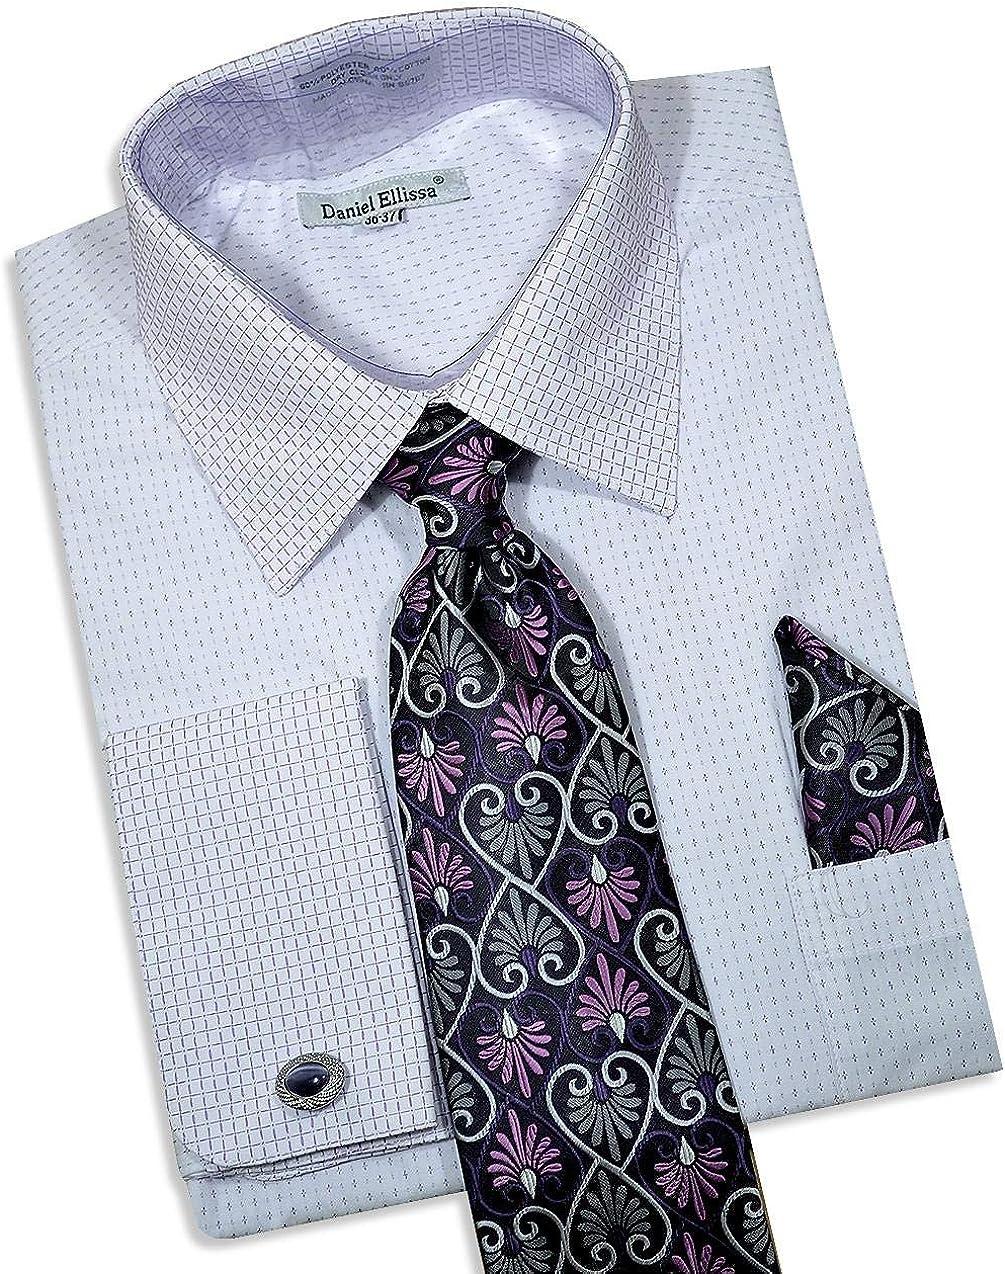 Mens Daniel Elissa French Cuff Dress Shirt Blue//WhiteTie Hanky Cufflinks Inc